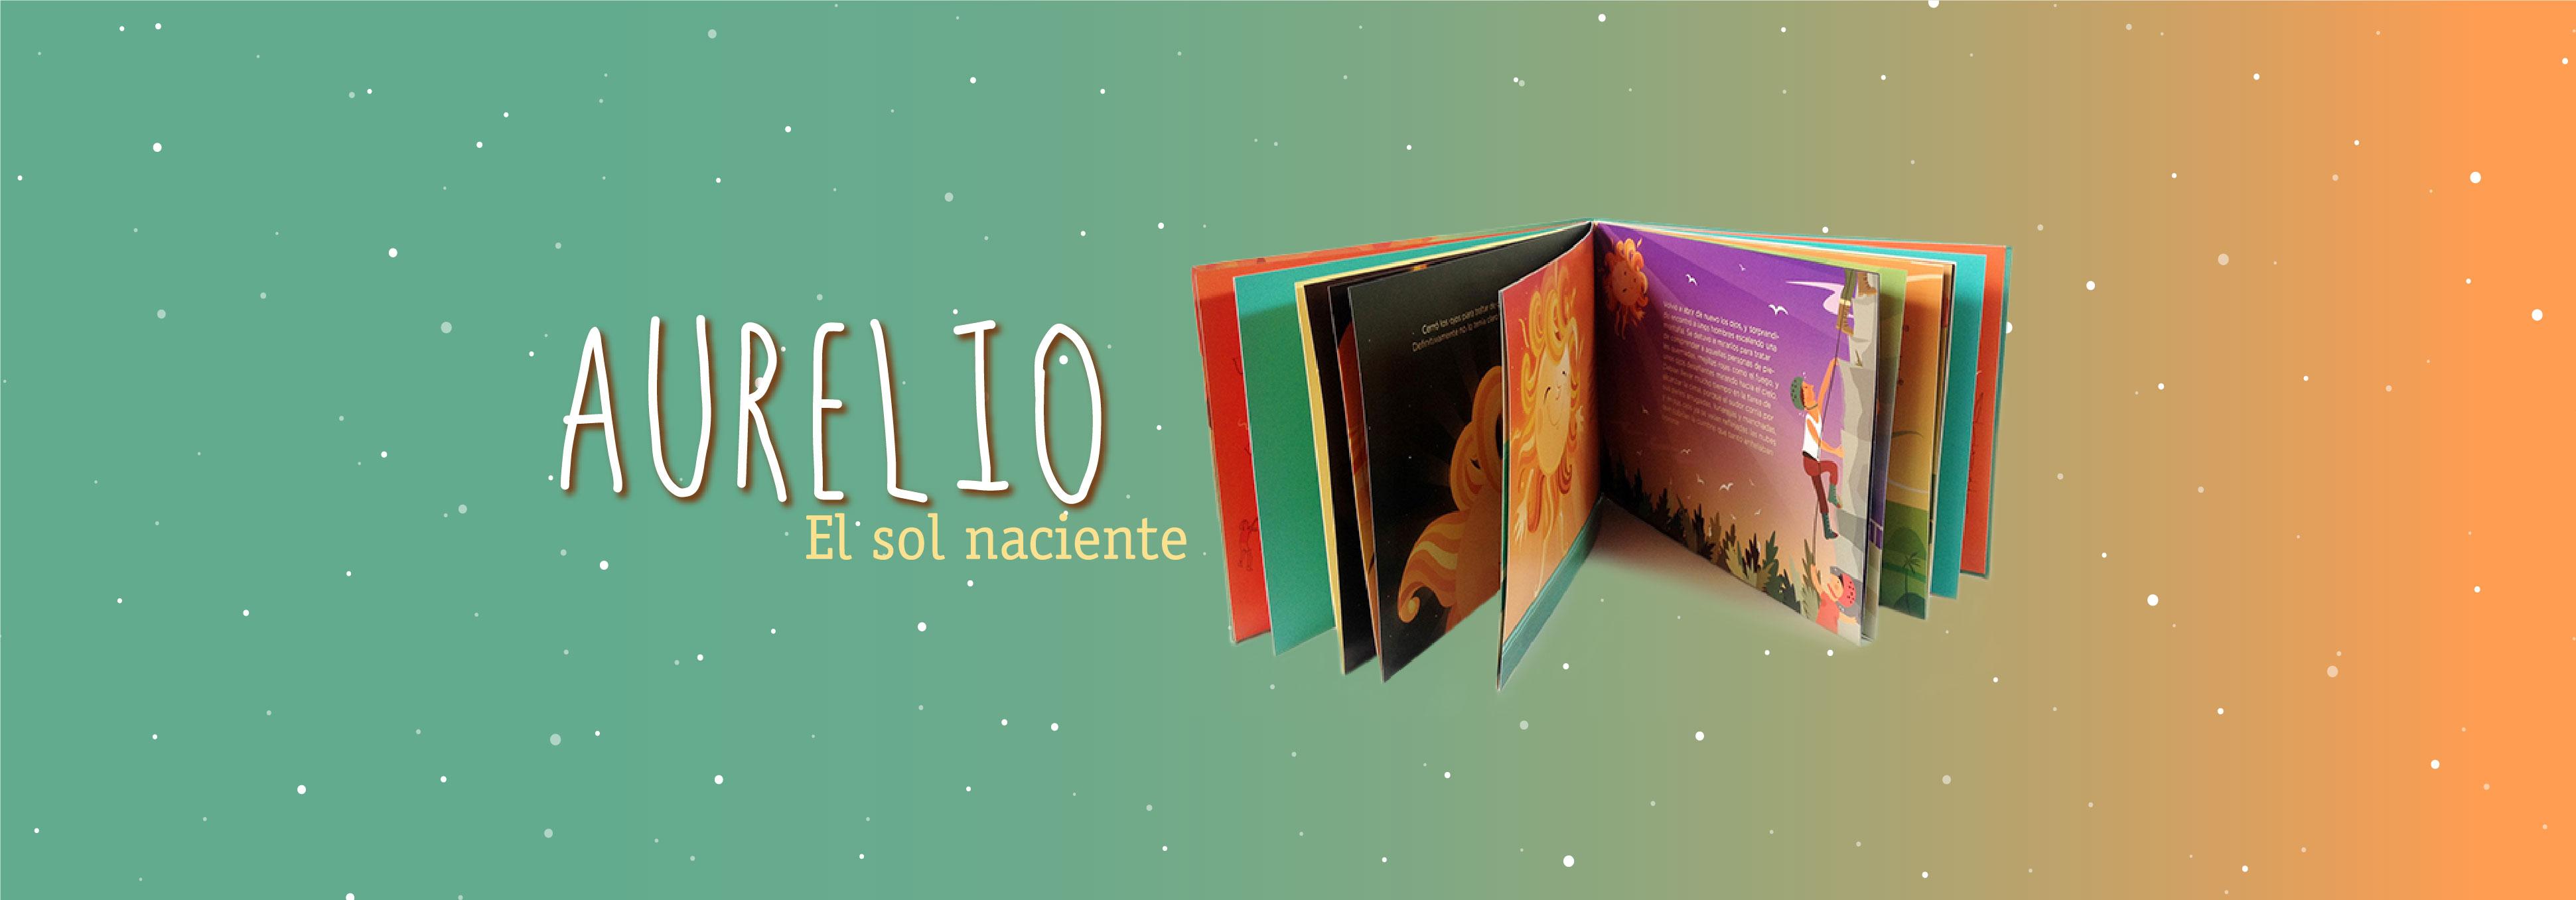 Lanzamiento Aurelio Banners-03